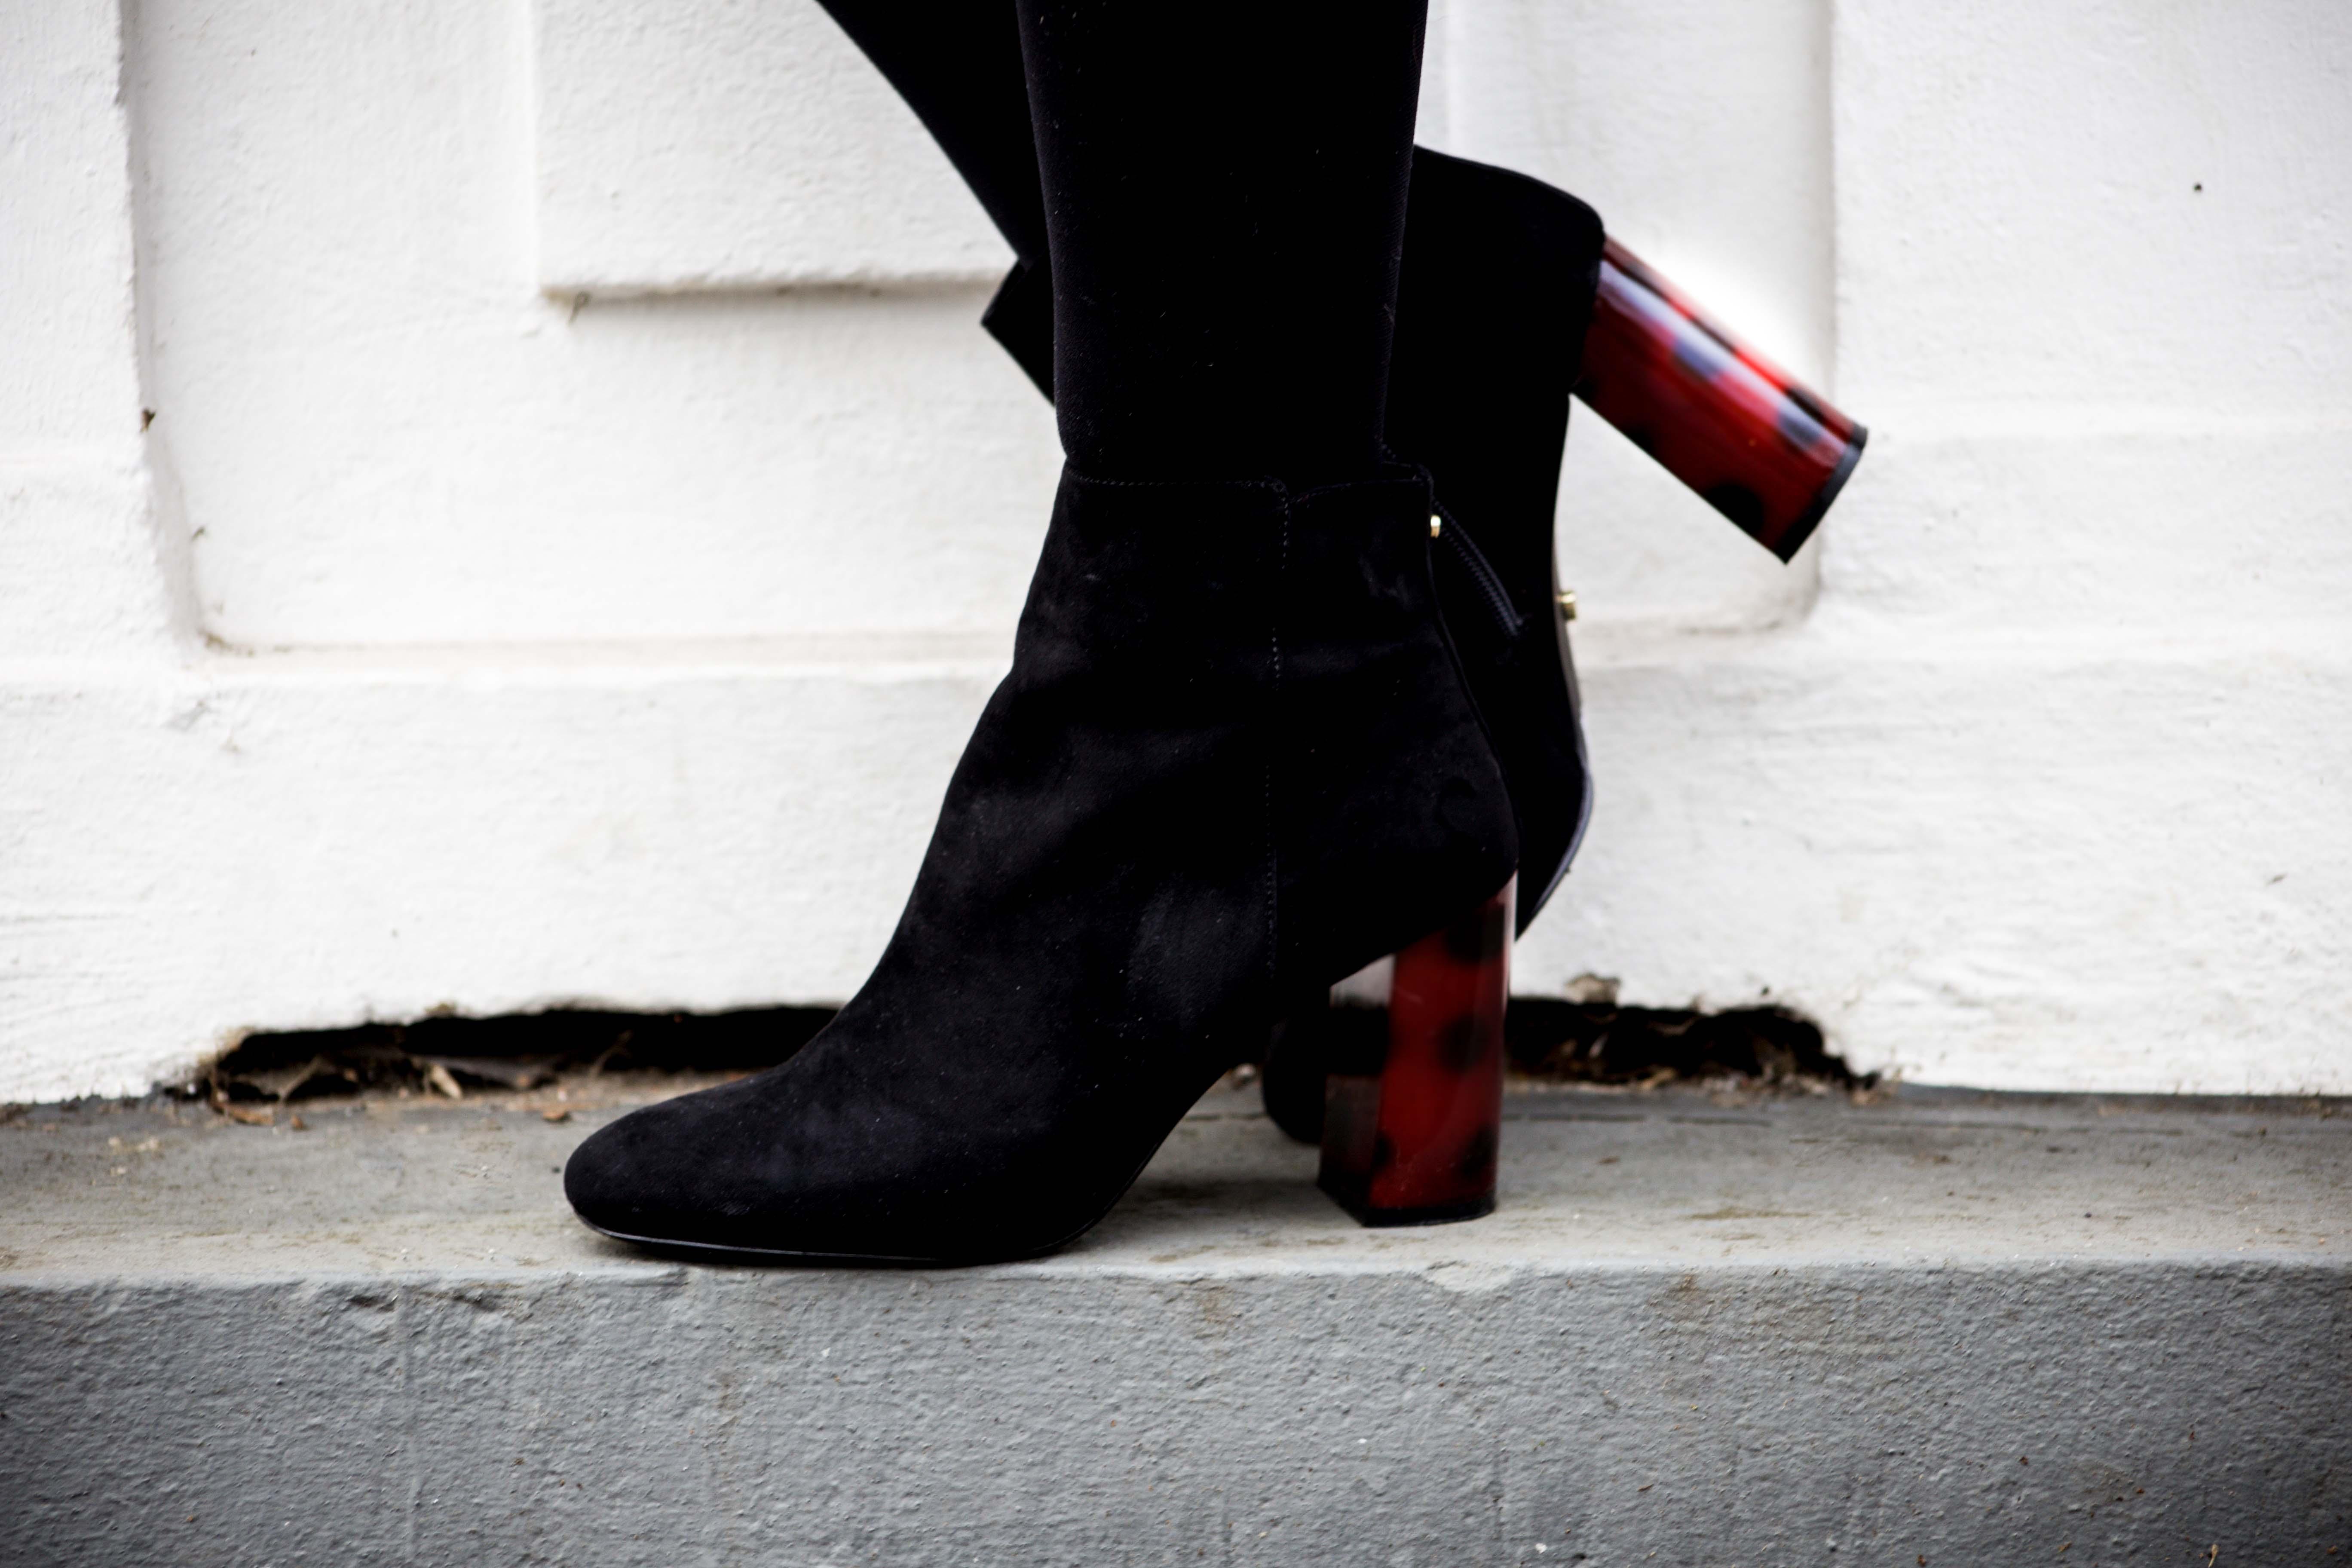 streetstyle-bonn-waldgrüner-mantel-rock-muster-print-fashionblogger-modeblog-mode-outfit_0135